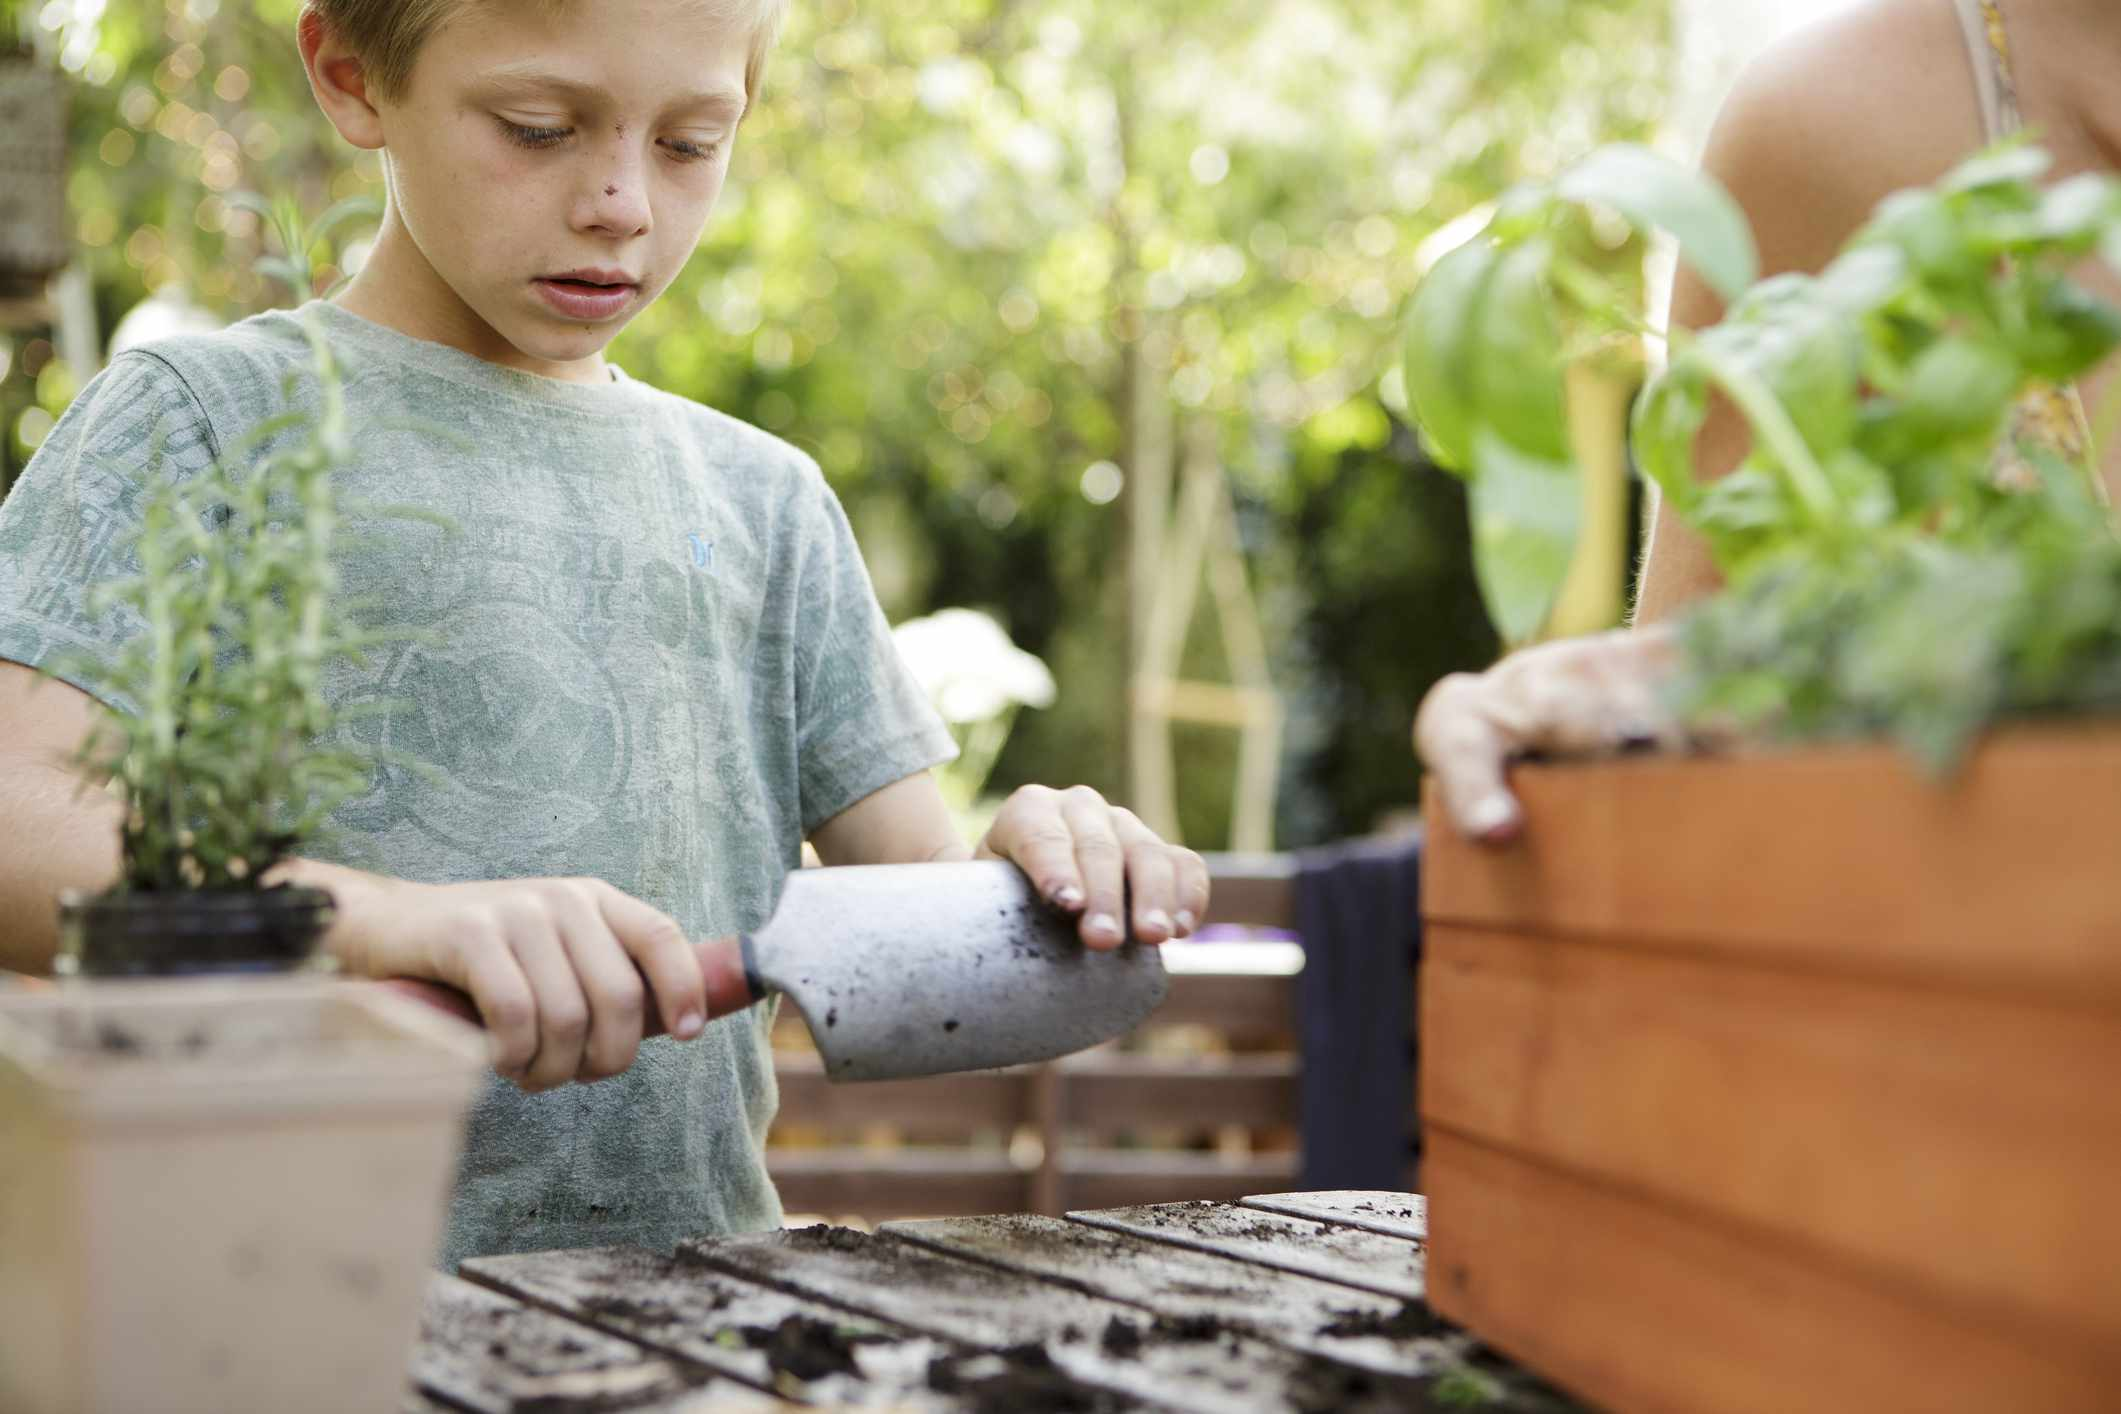 kid with trowel planting plants